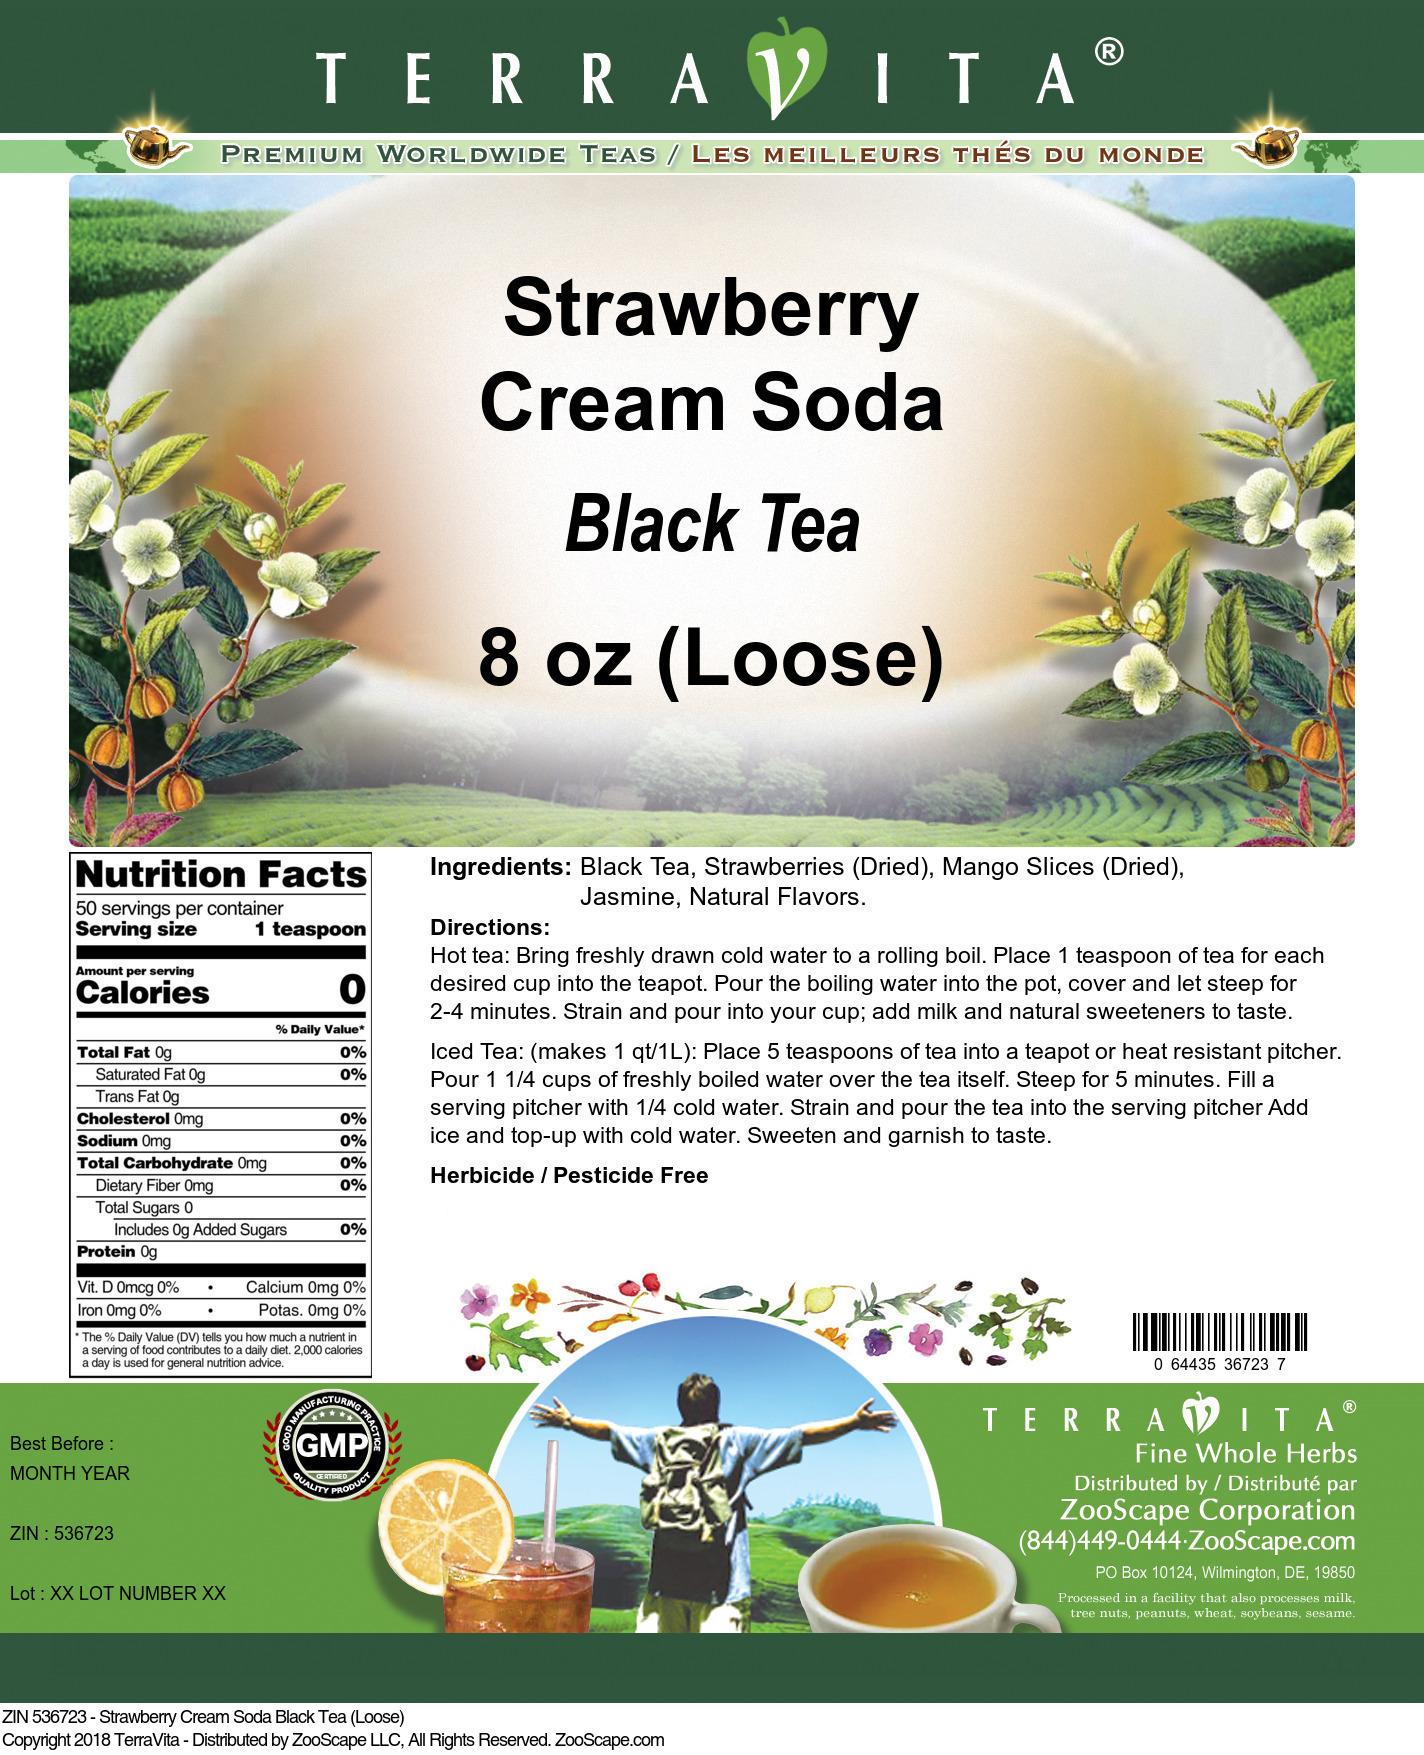 Strawberry Cream Soda Black Tea (Loose)